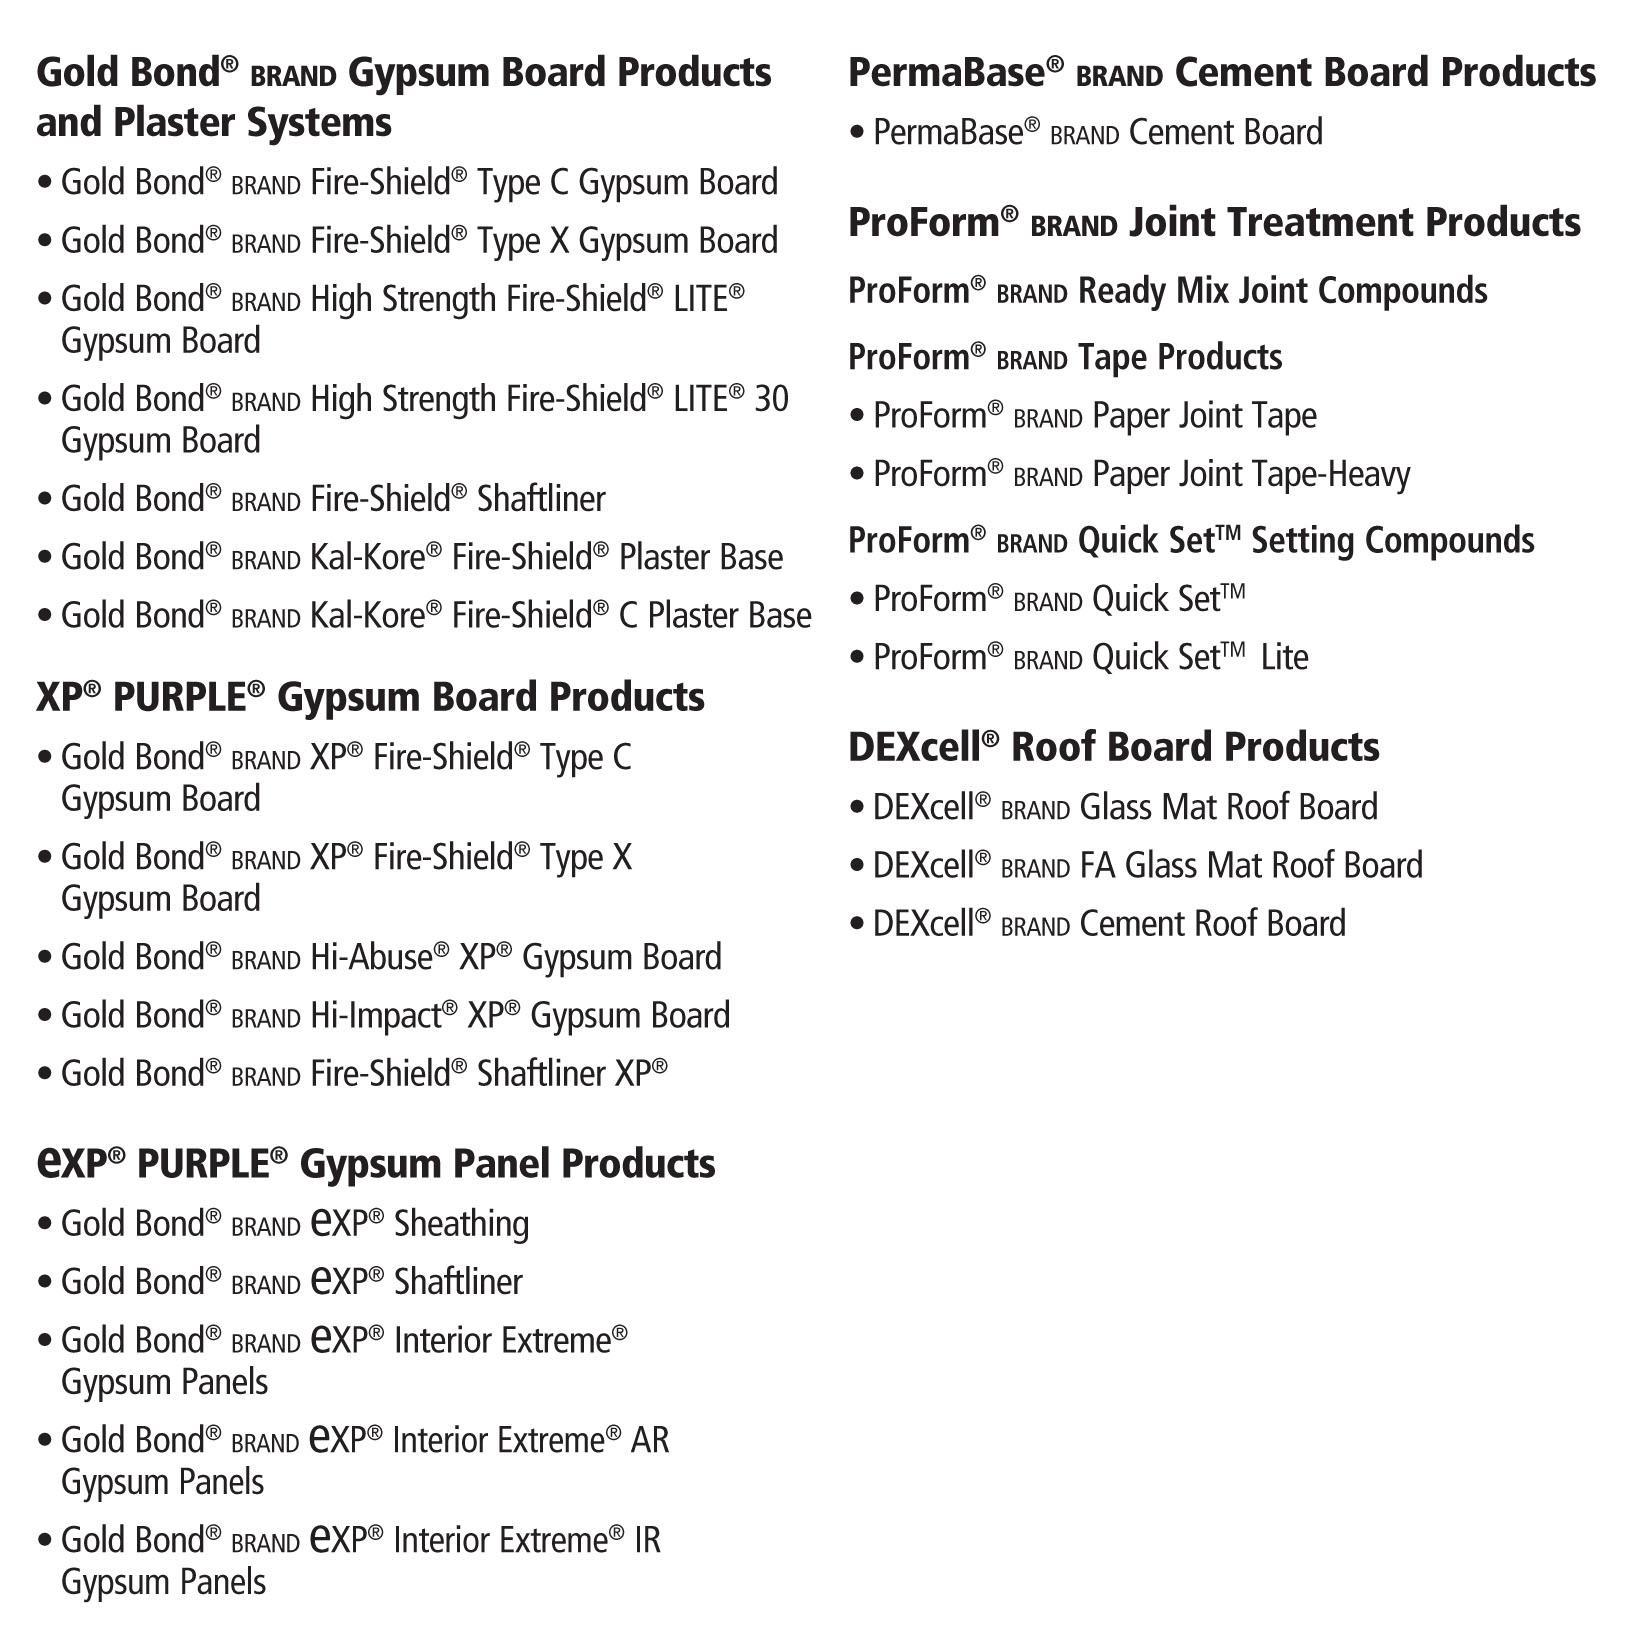 OnBoard June 2018 | HPD Declare Product List